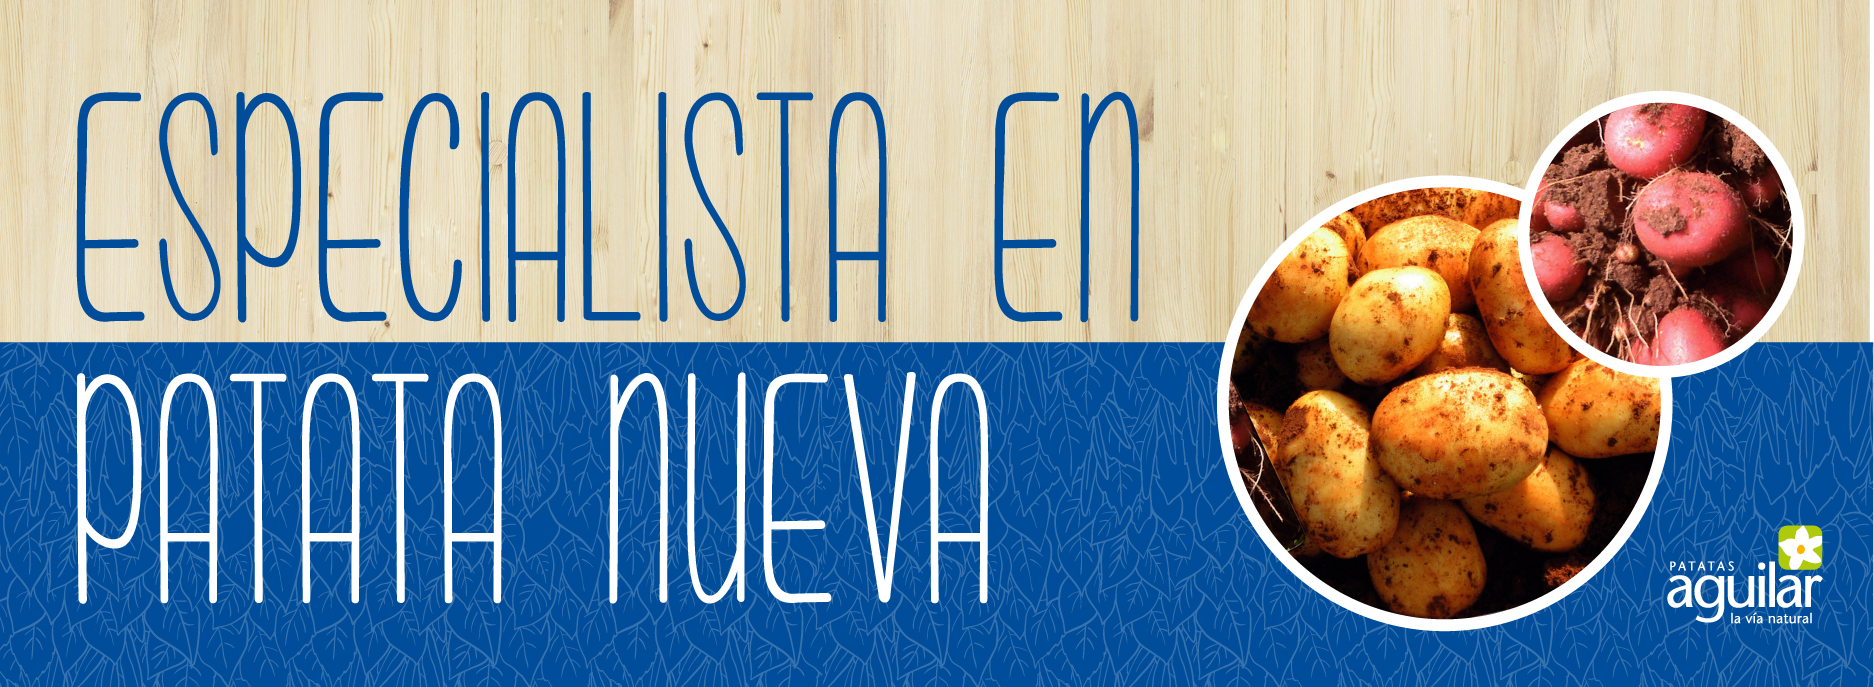 banner-newpotato_ES